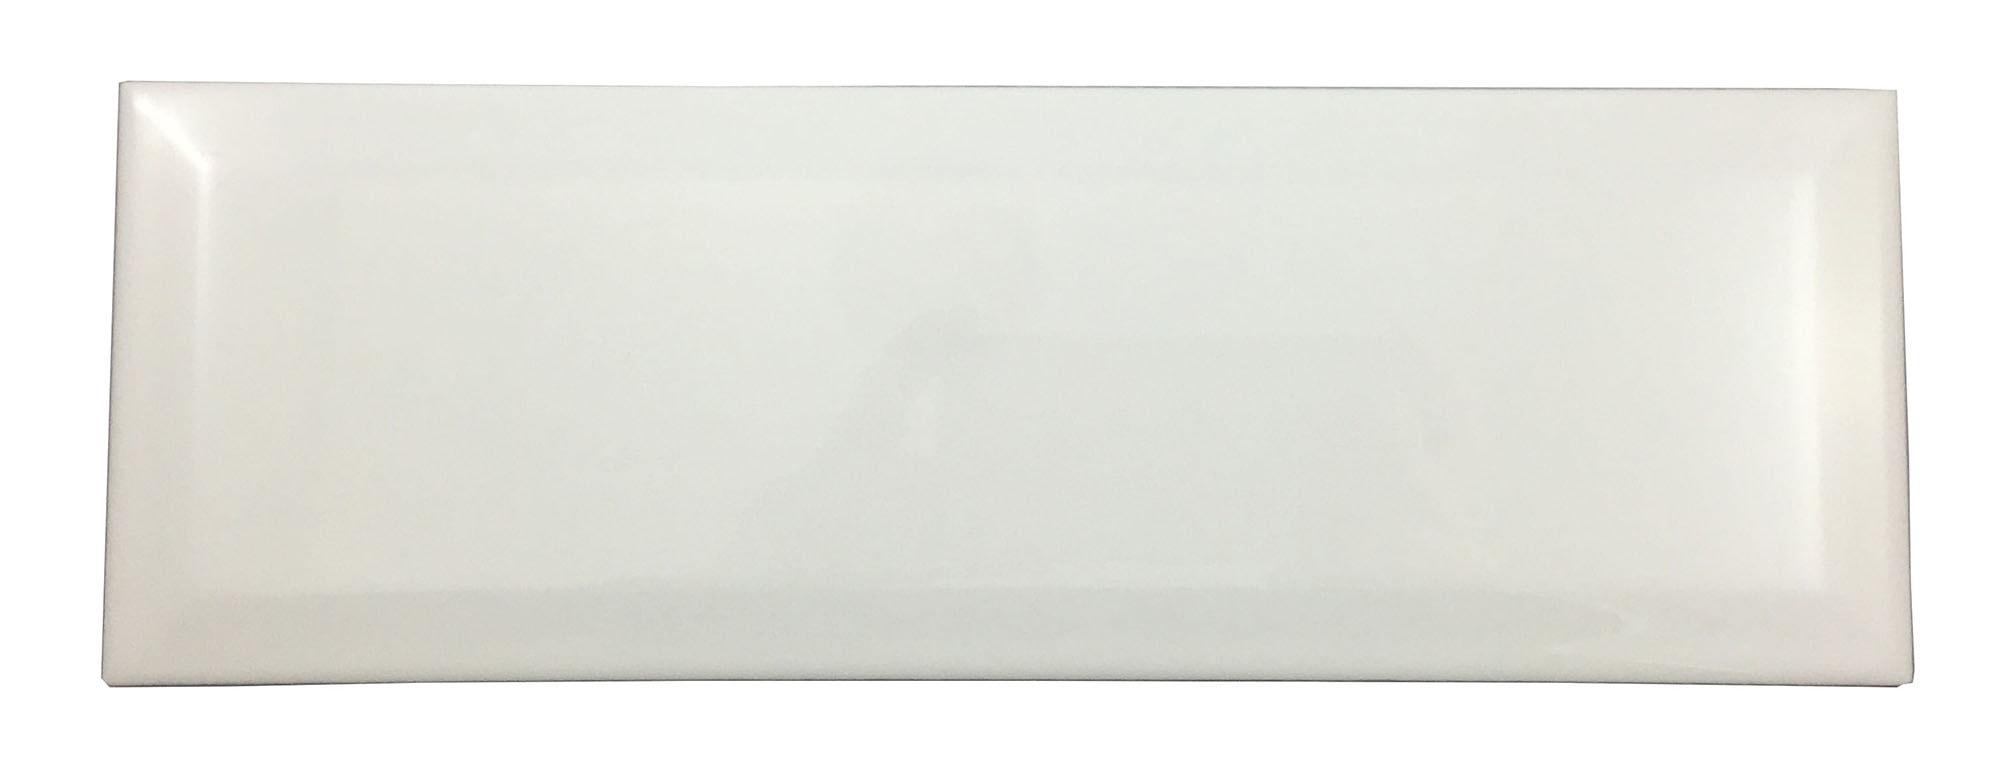 "White Beveled / 4""x12"" / Gloss Subway Tile 0"